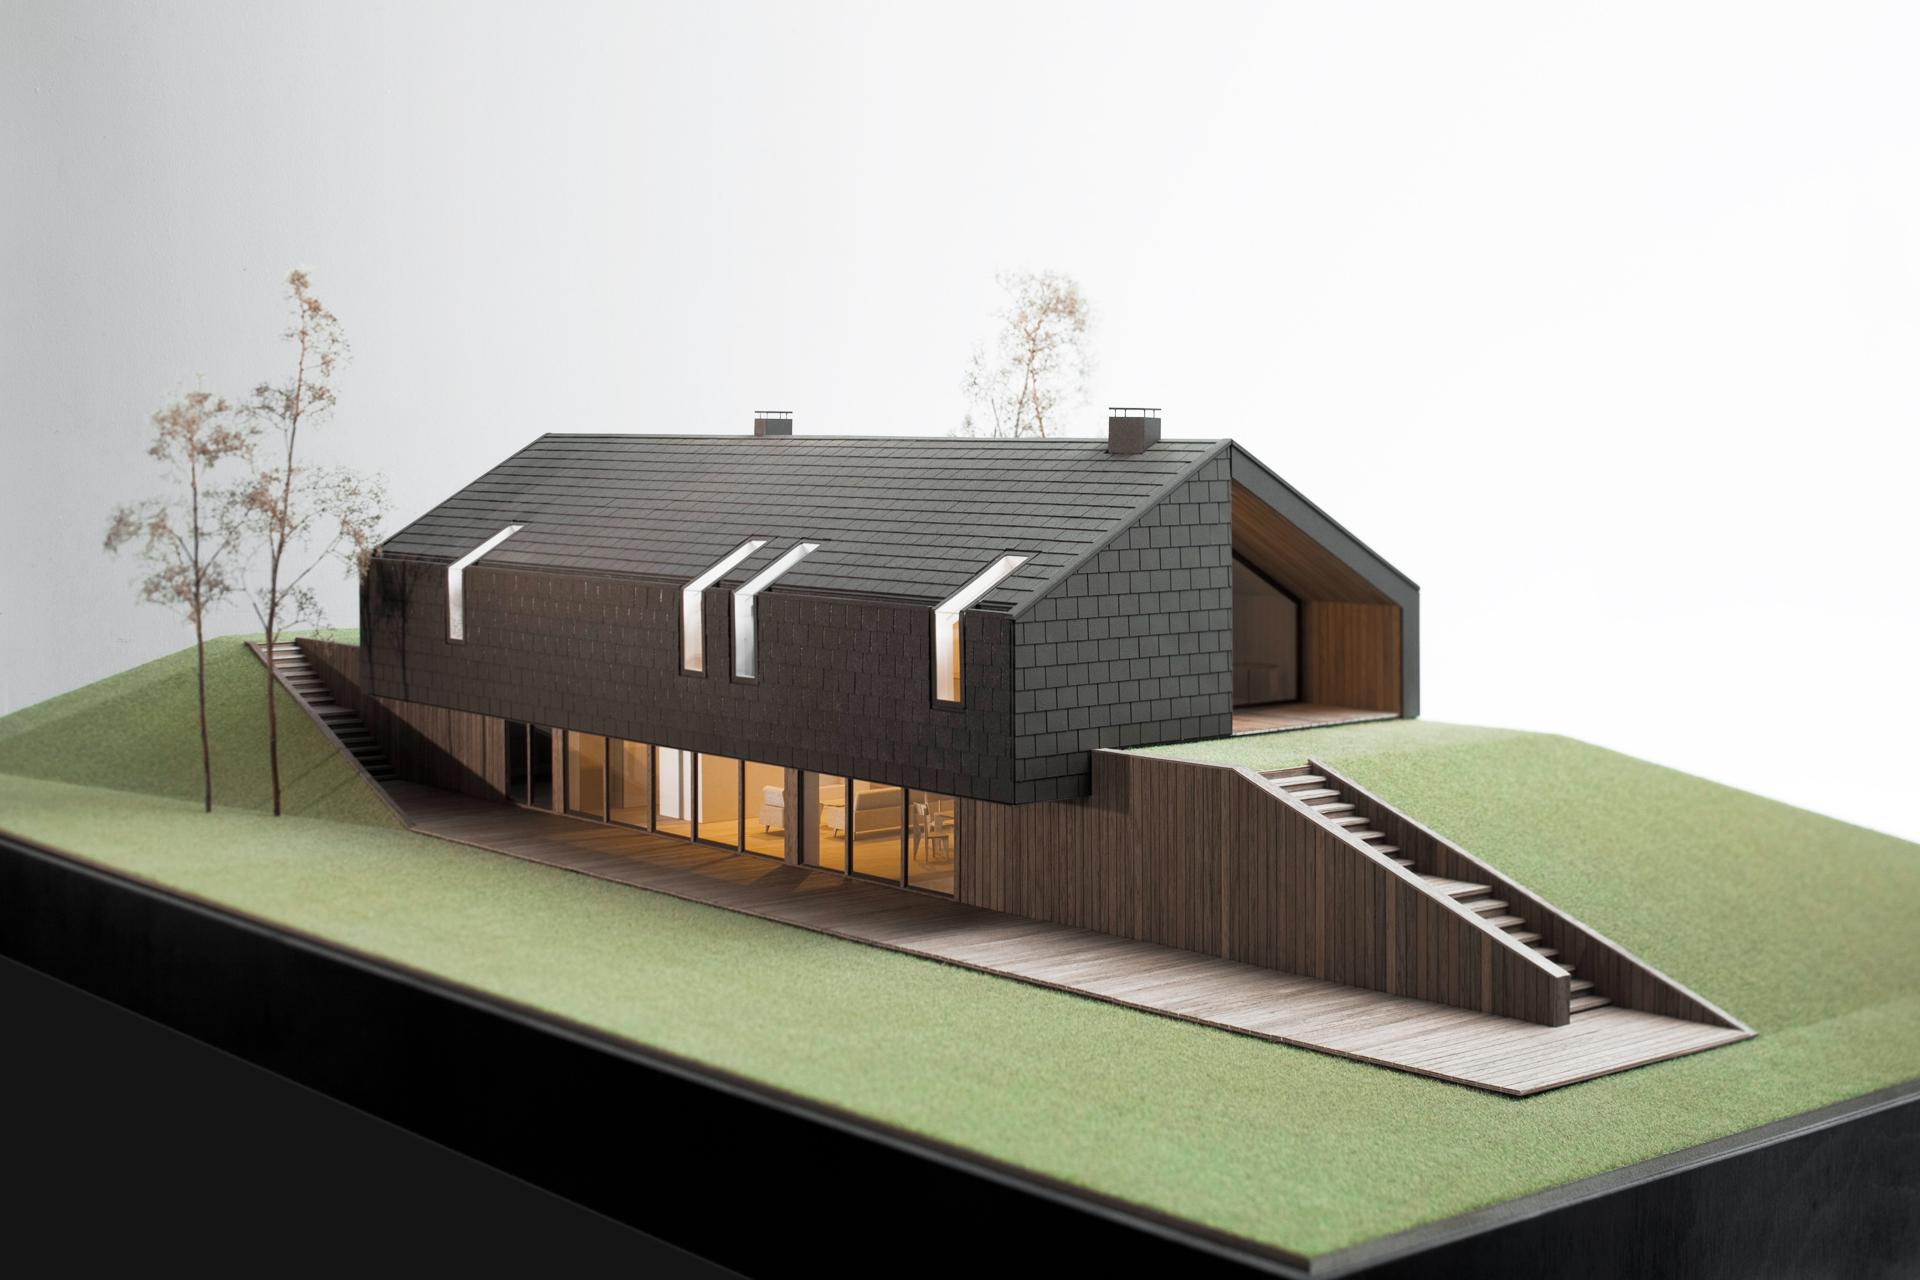 onimo-makiety-architektoniczne-PAG-slope-02